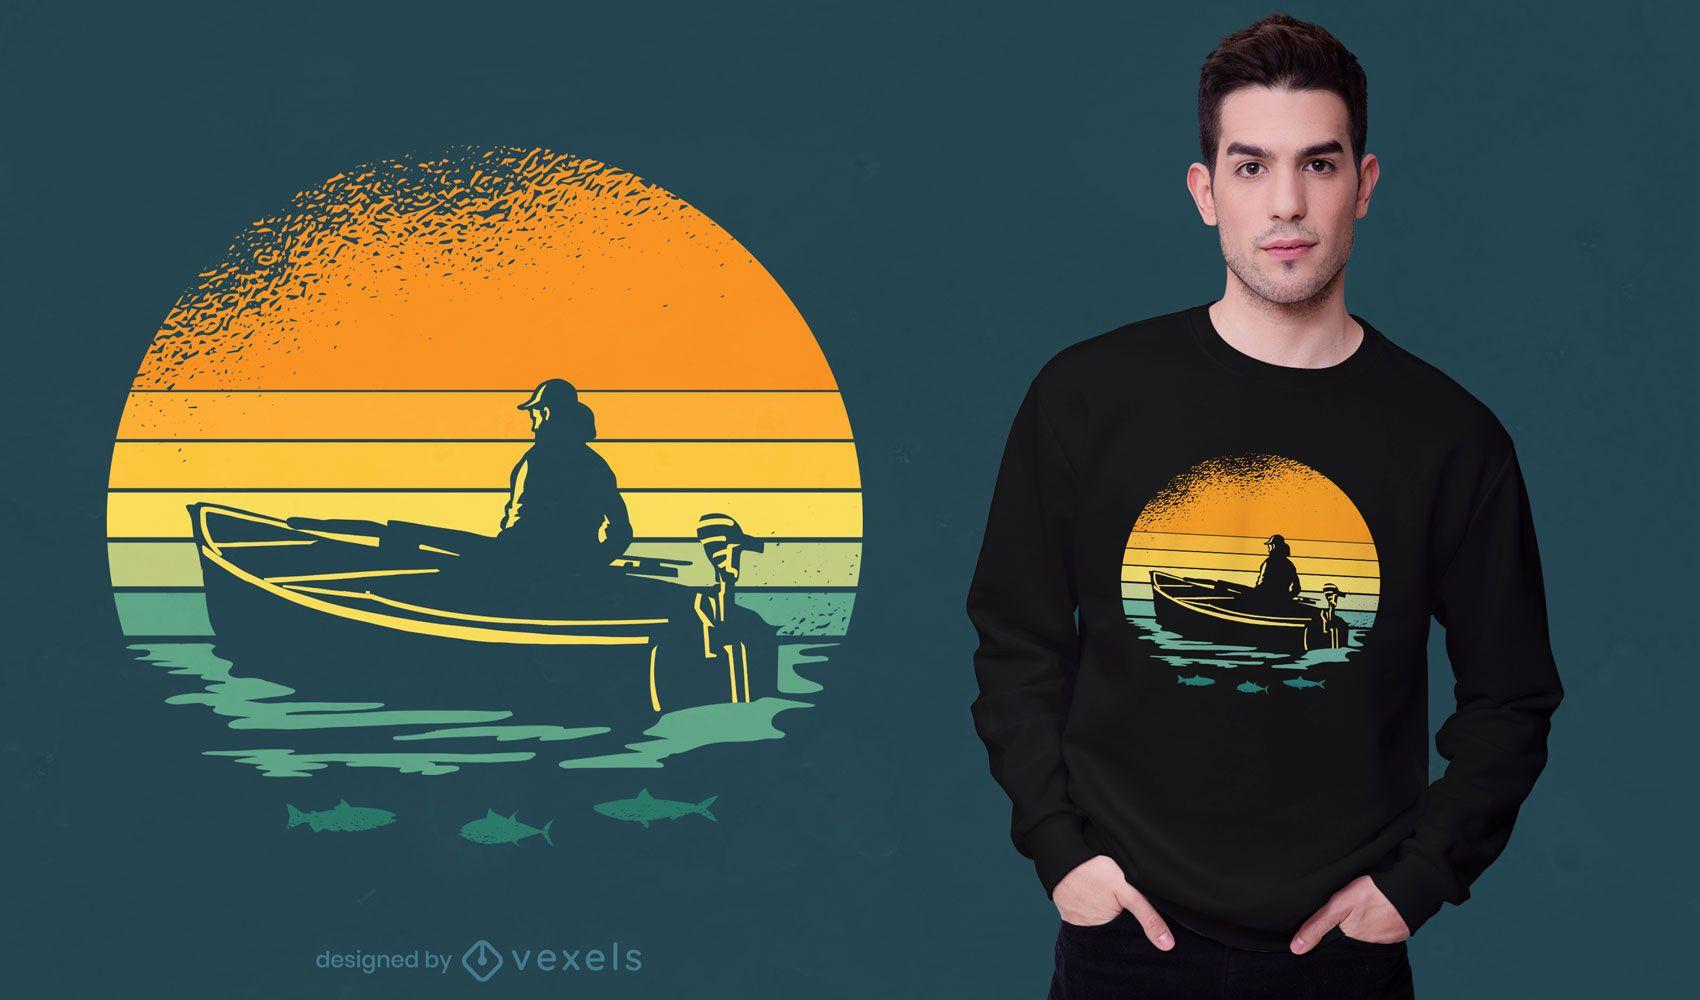 Retro sunset boat t-shirt design